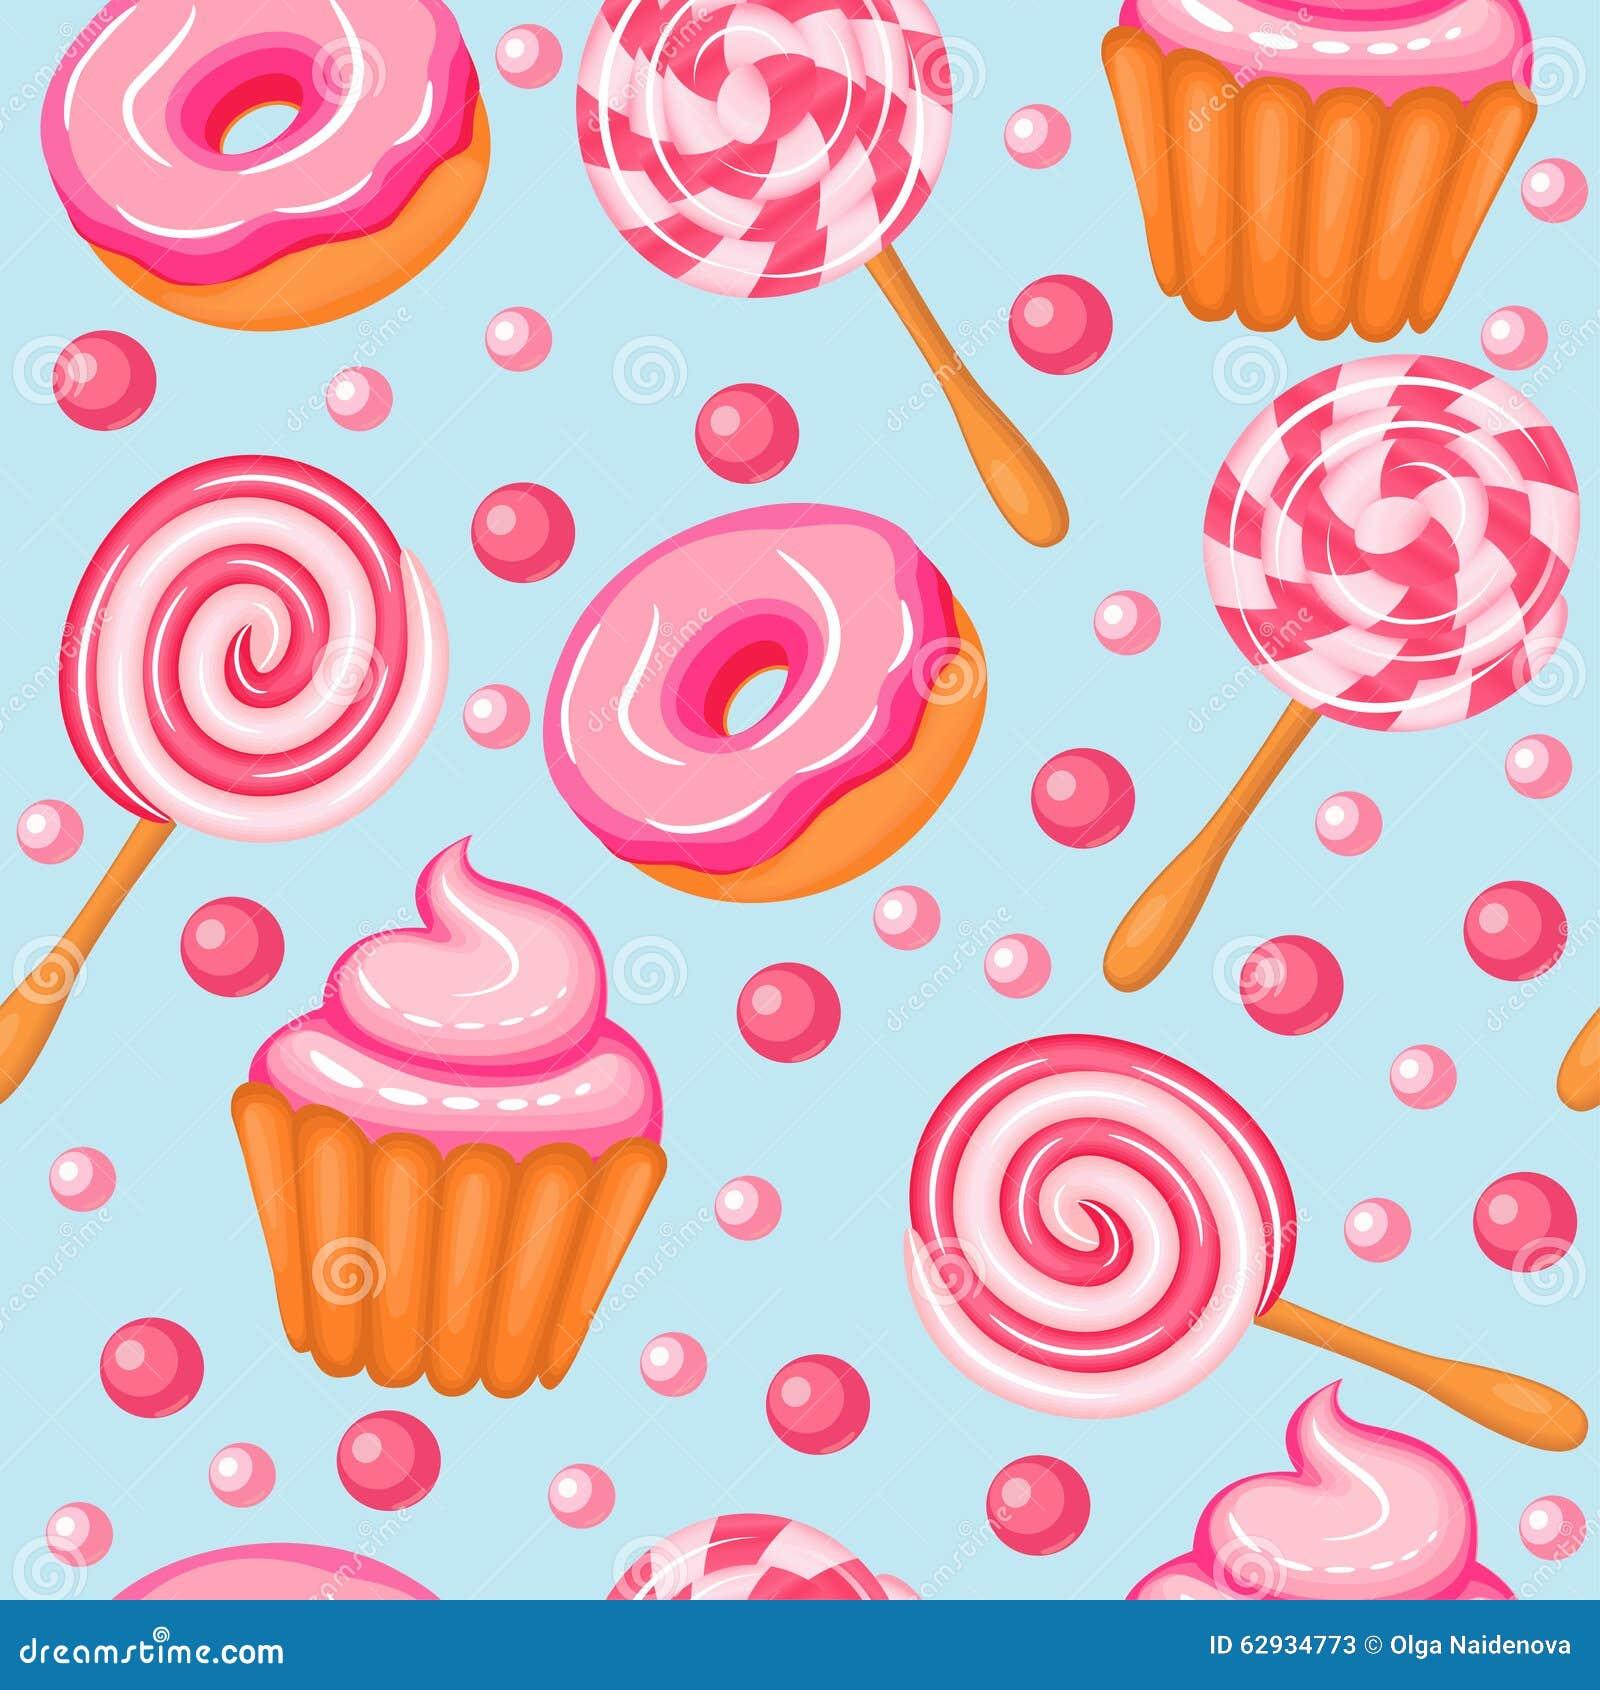 candy crush saga wallpaper